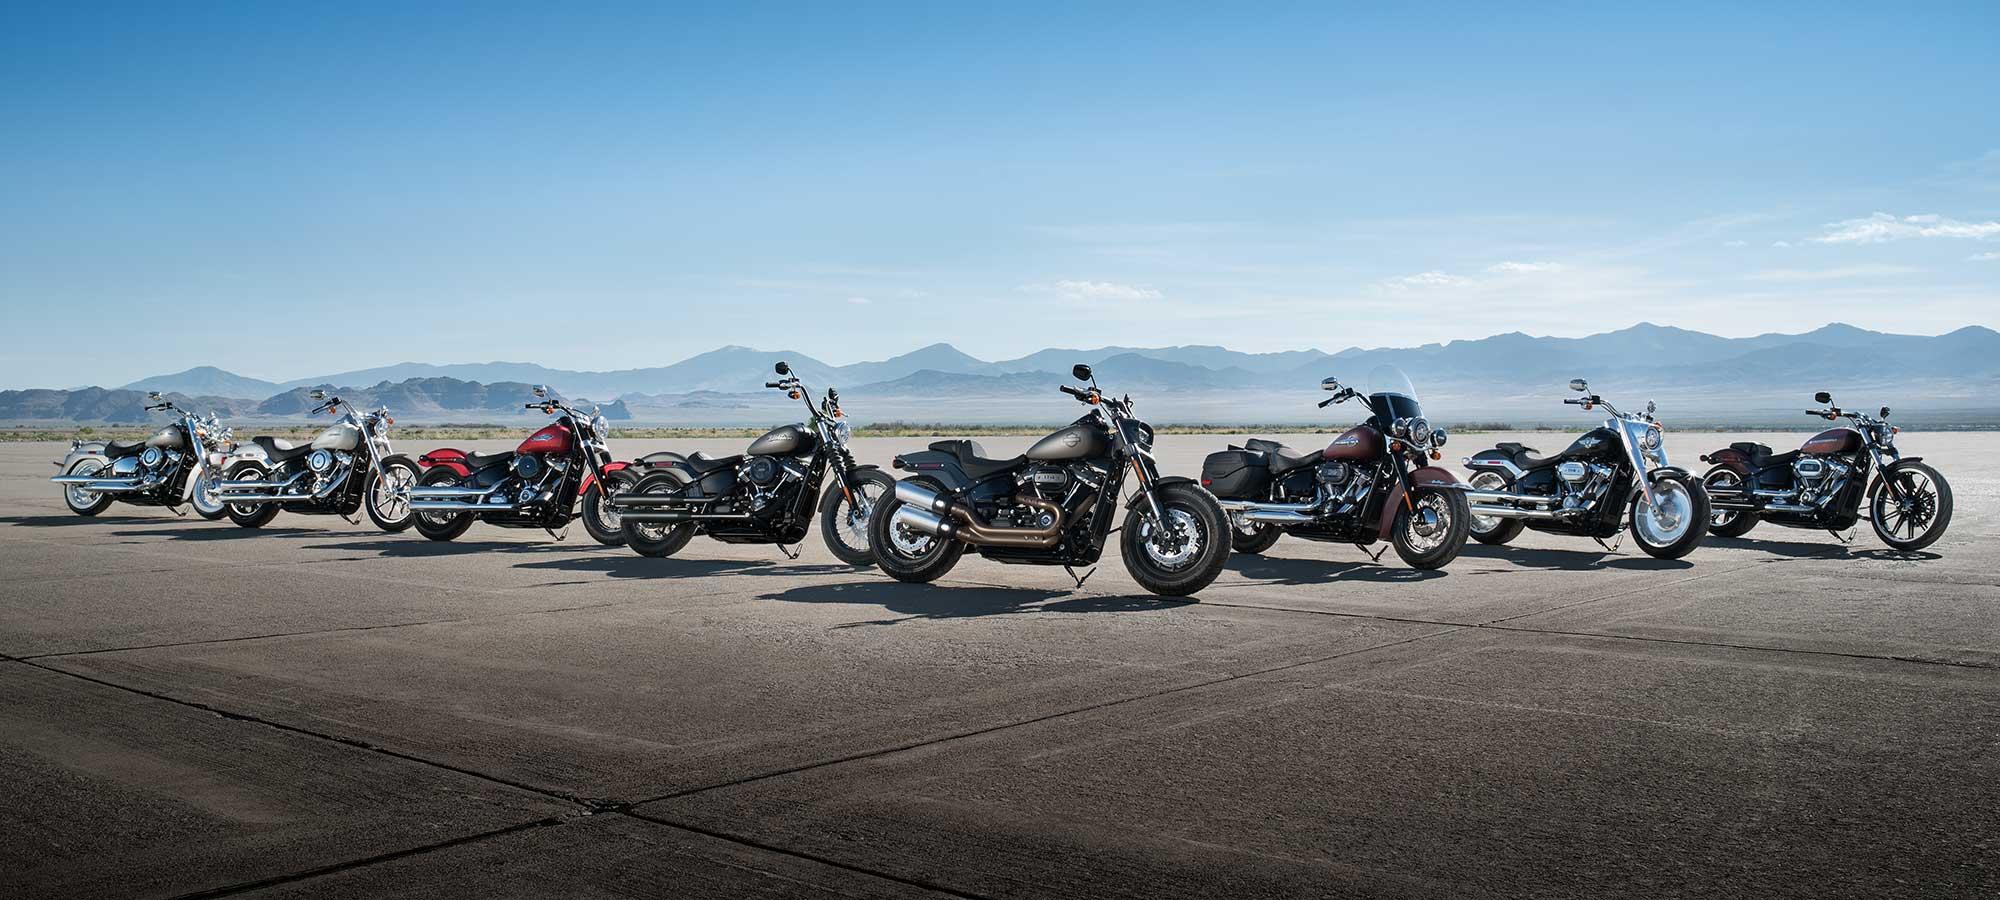 2018 Harley-Davidson Softail Lineup